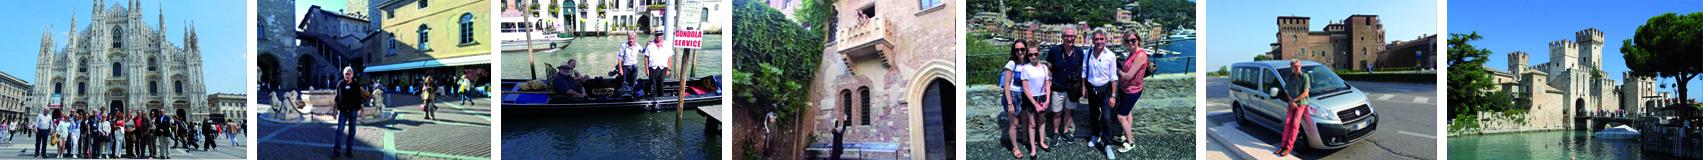 Visitas guiadas norte de Italia